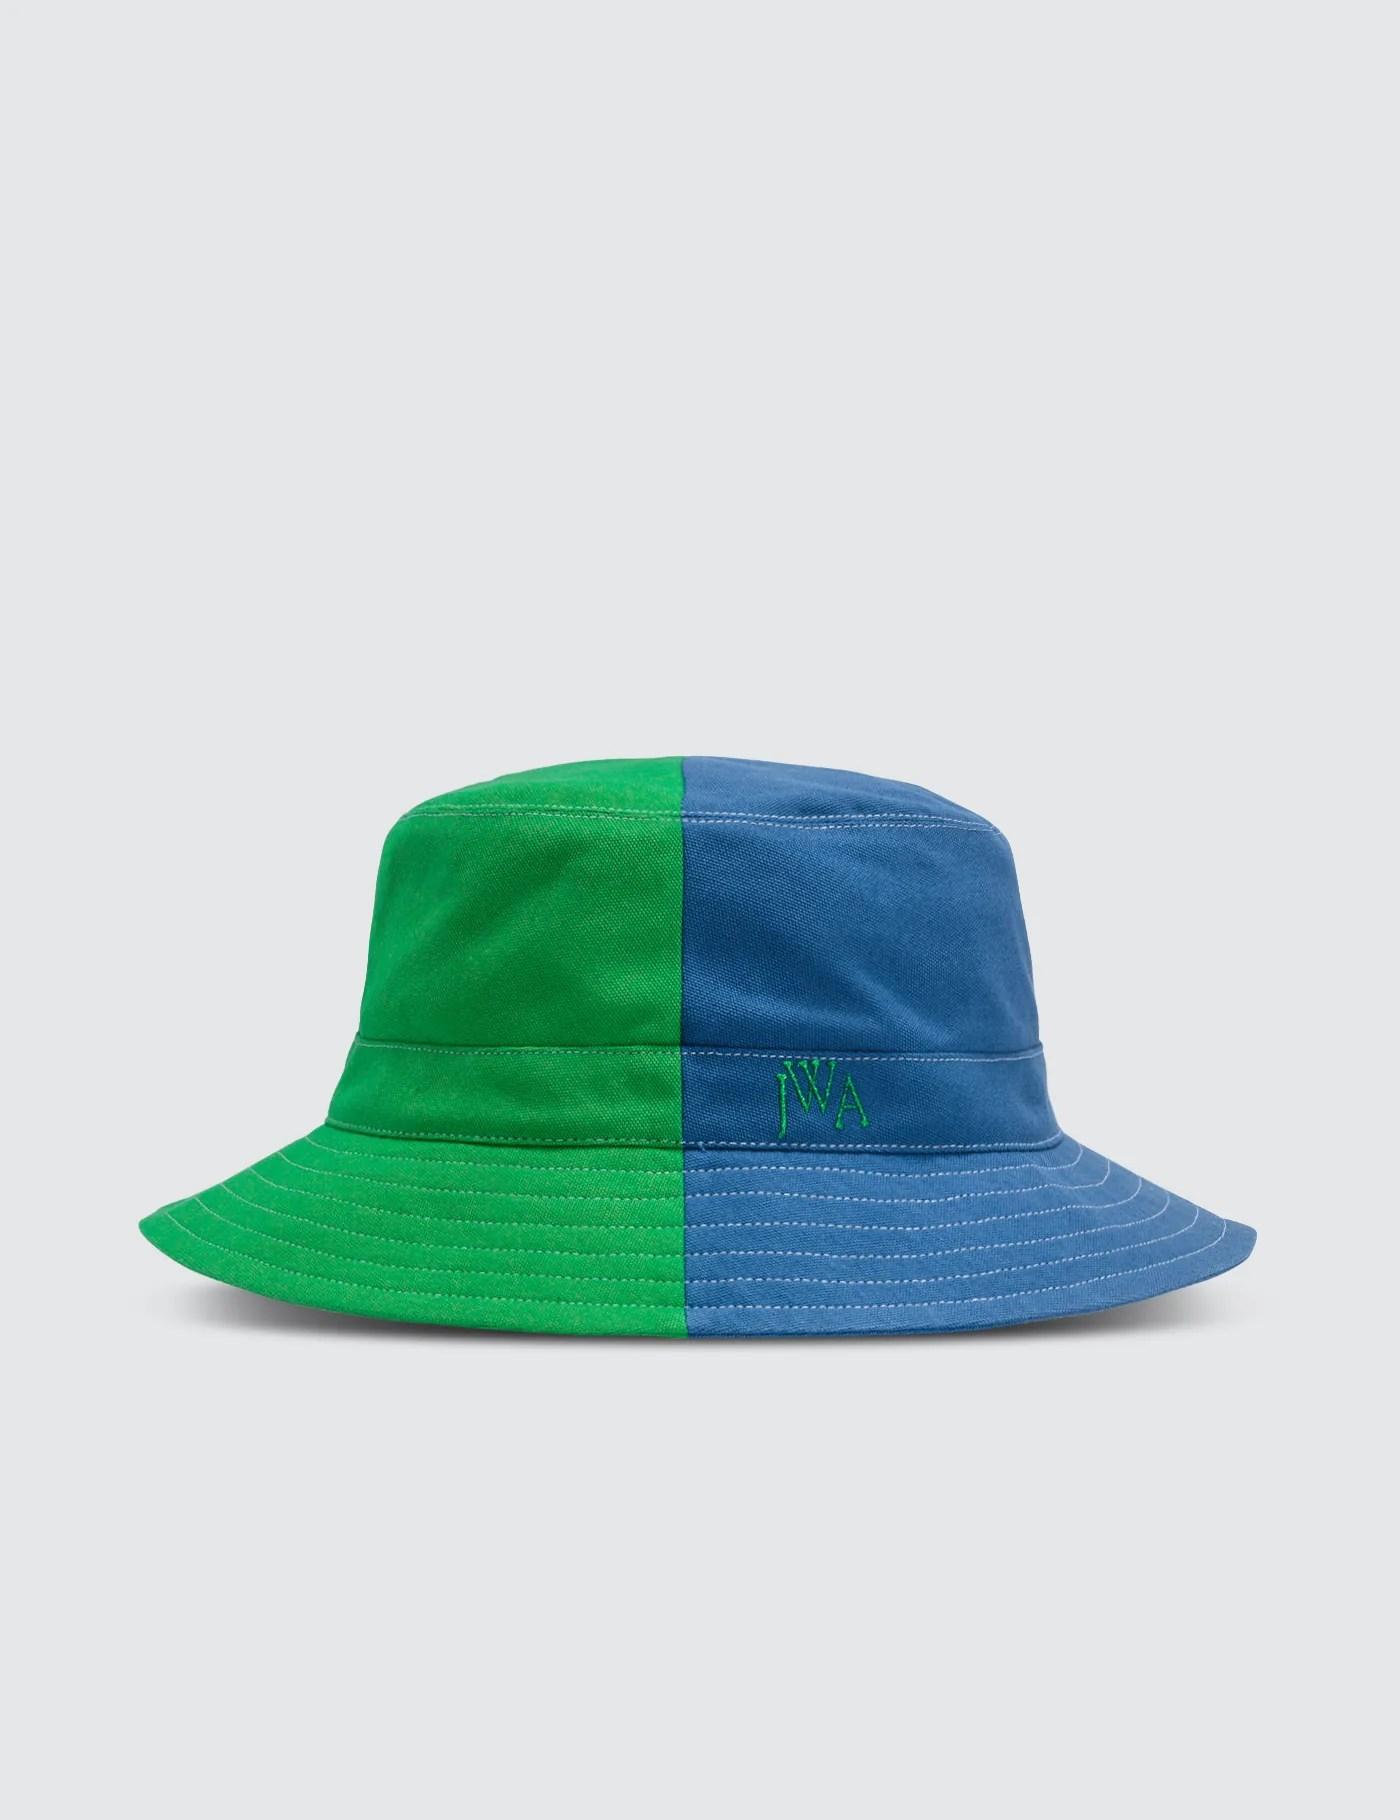 JW ANDERSON BUCKET HAT